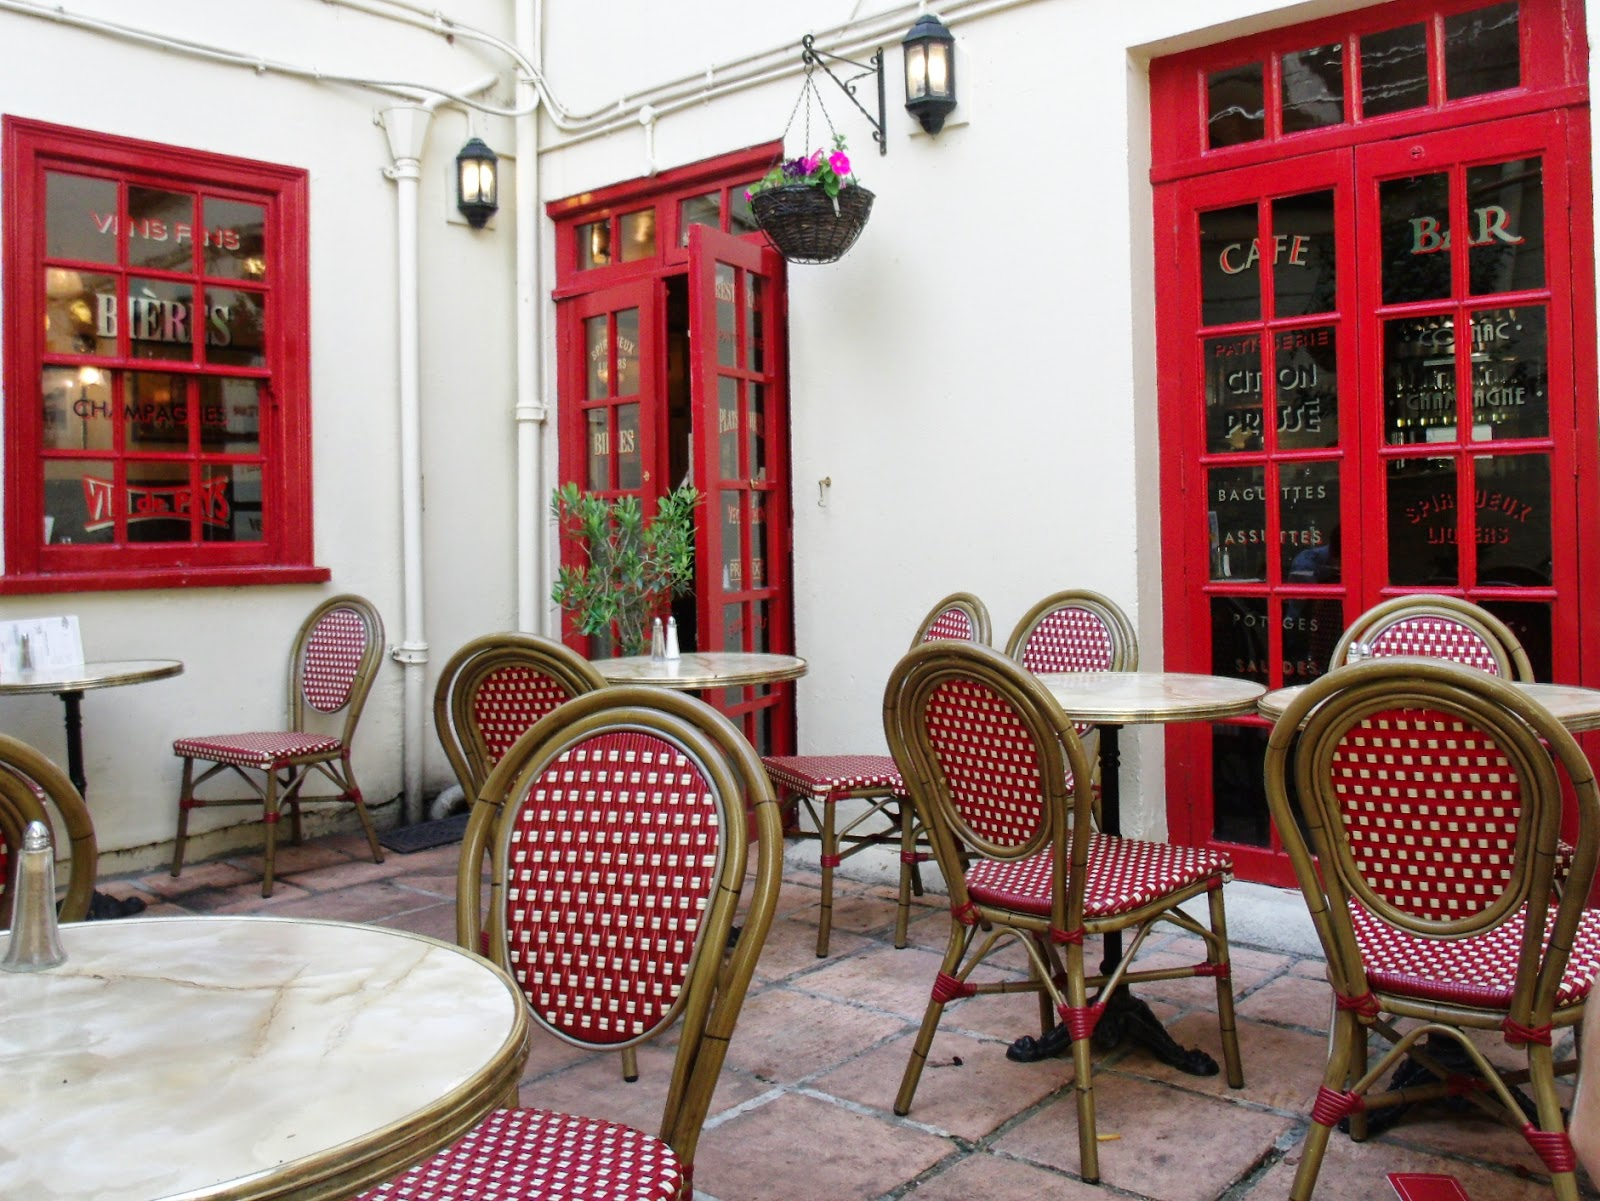 Cafe Rouge, Cambridge